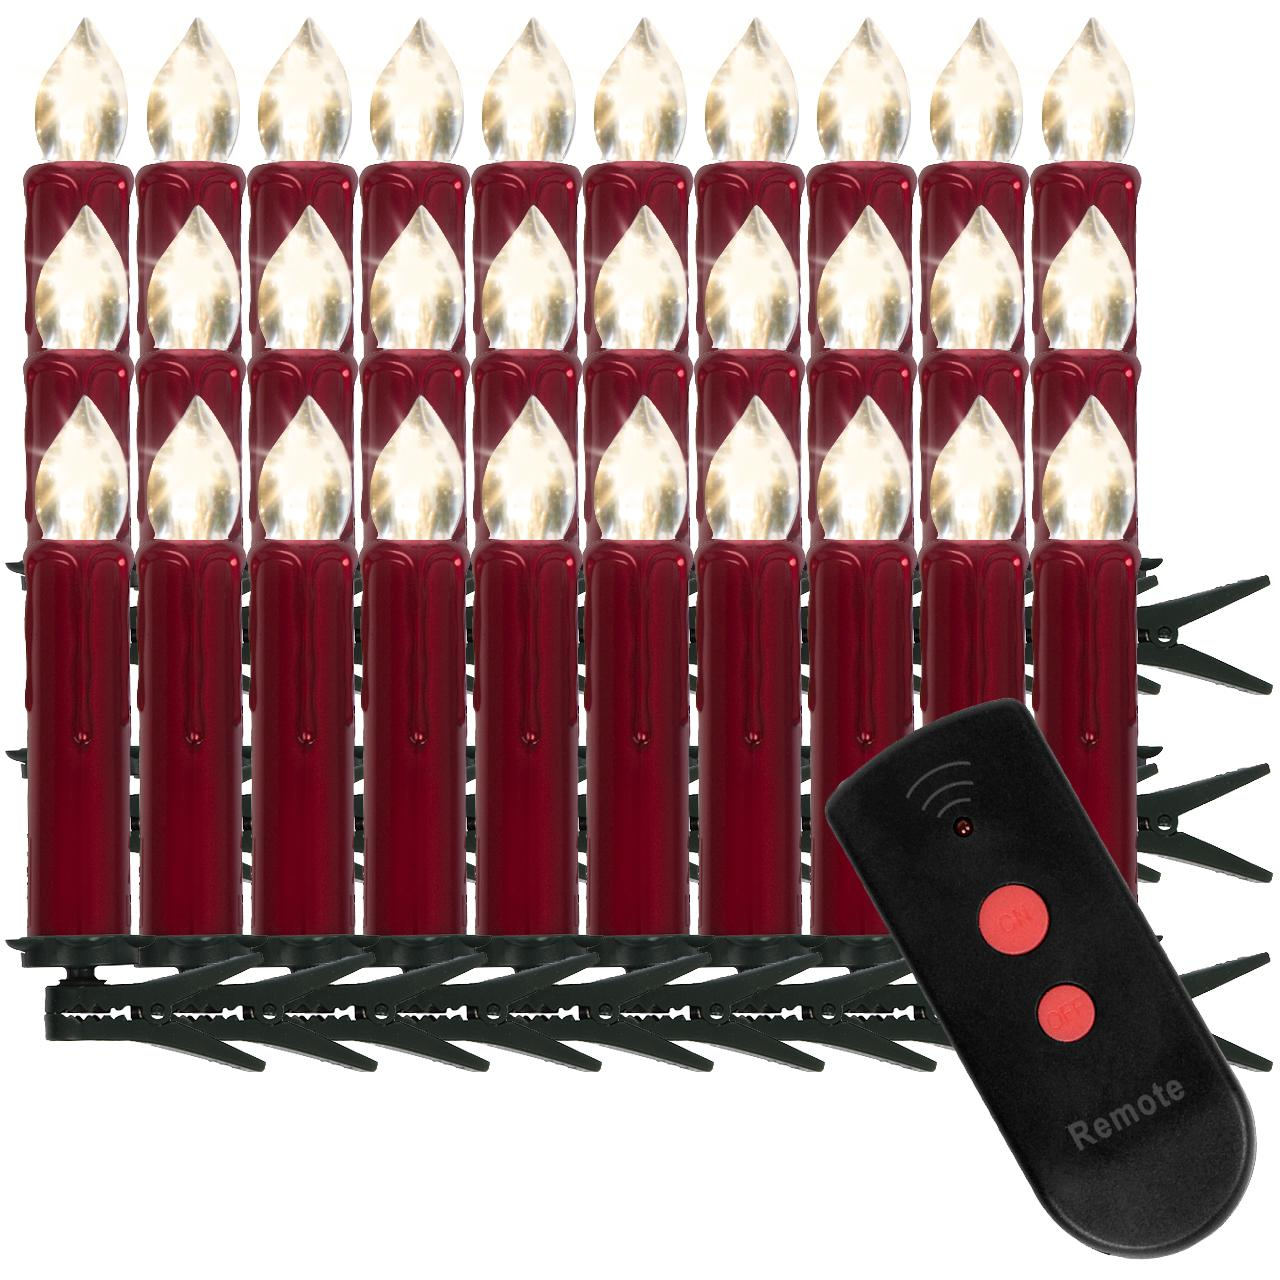 kabellose led weihnachtskerzen 20 30 40 lichterkette. Black Bedroom Furniture Sets. Home Design Ideas